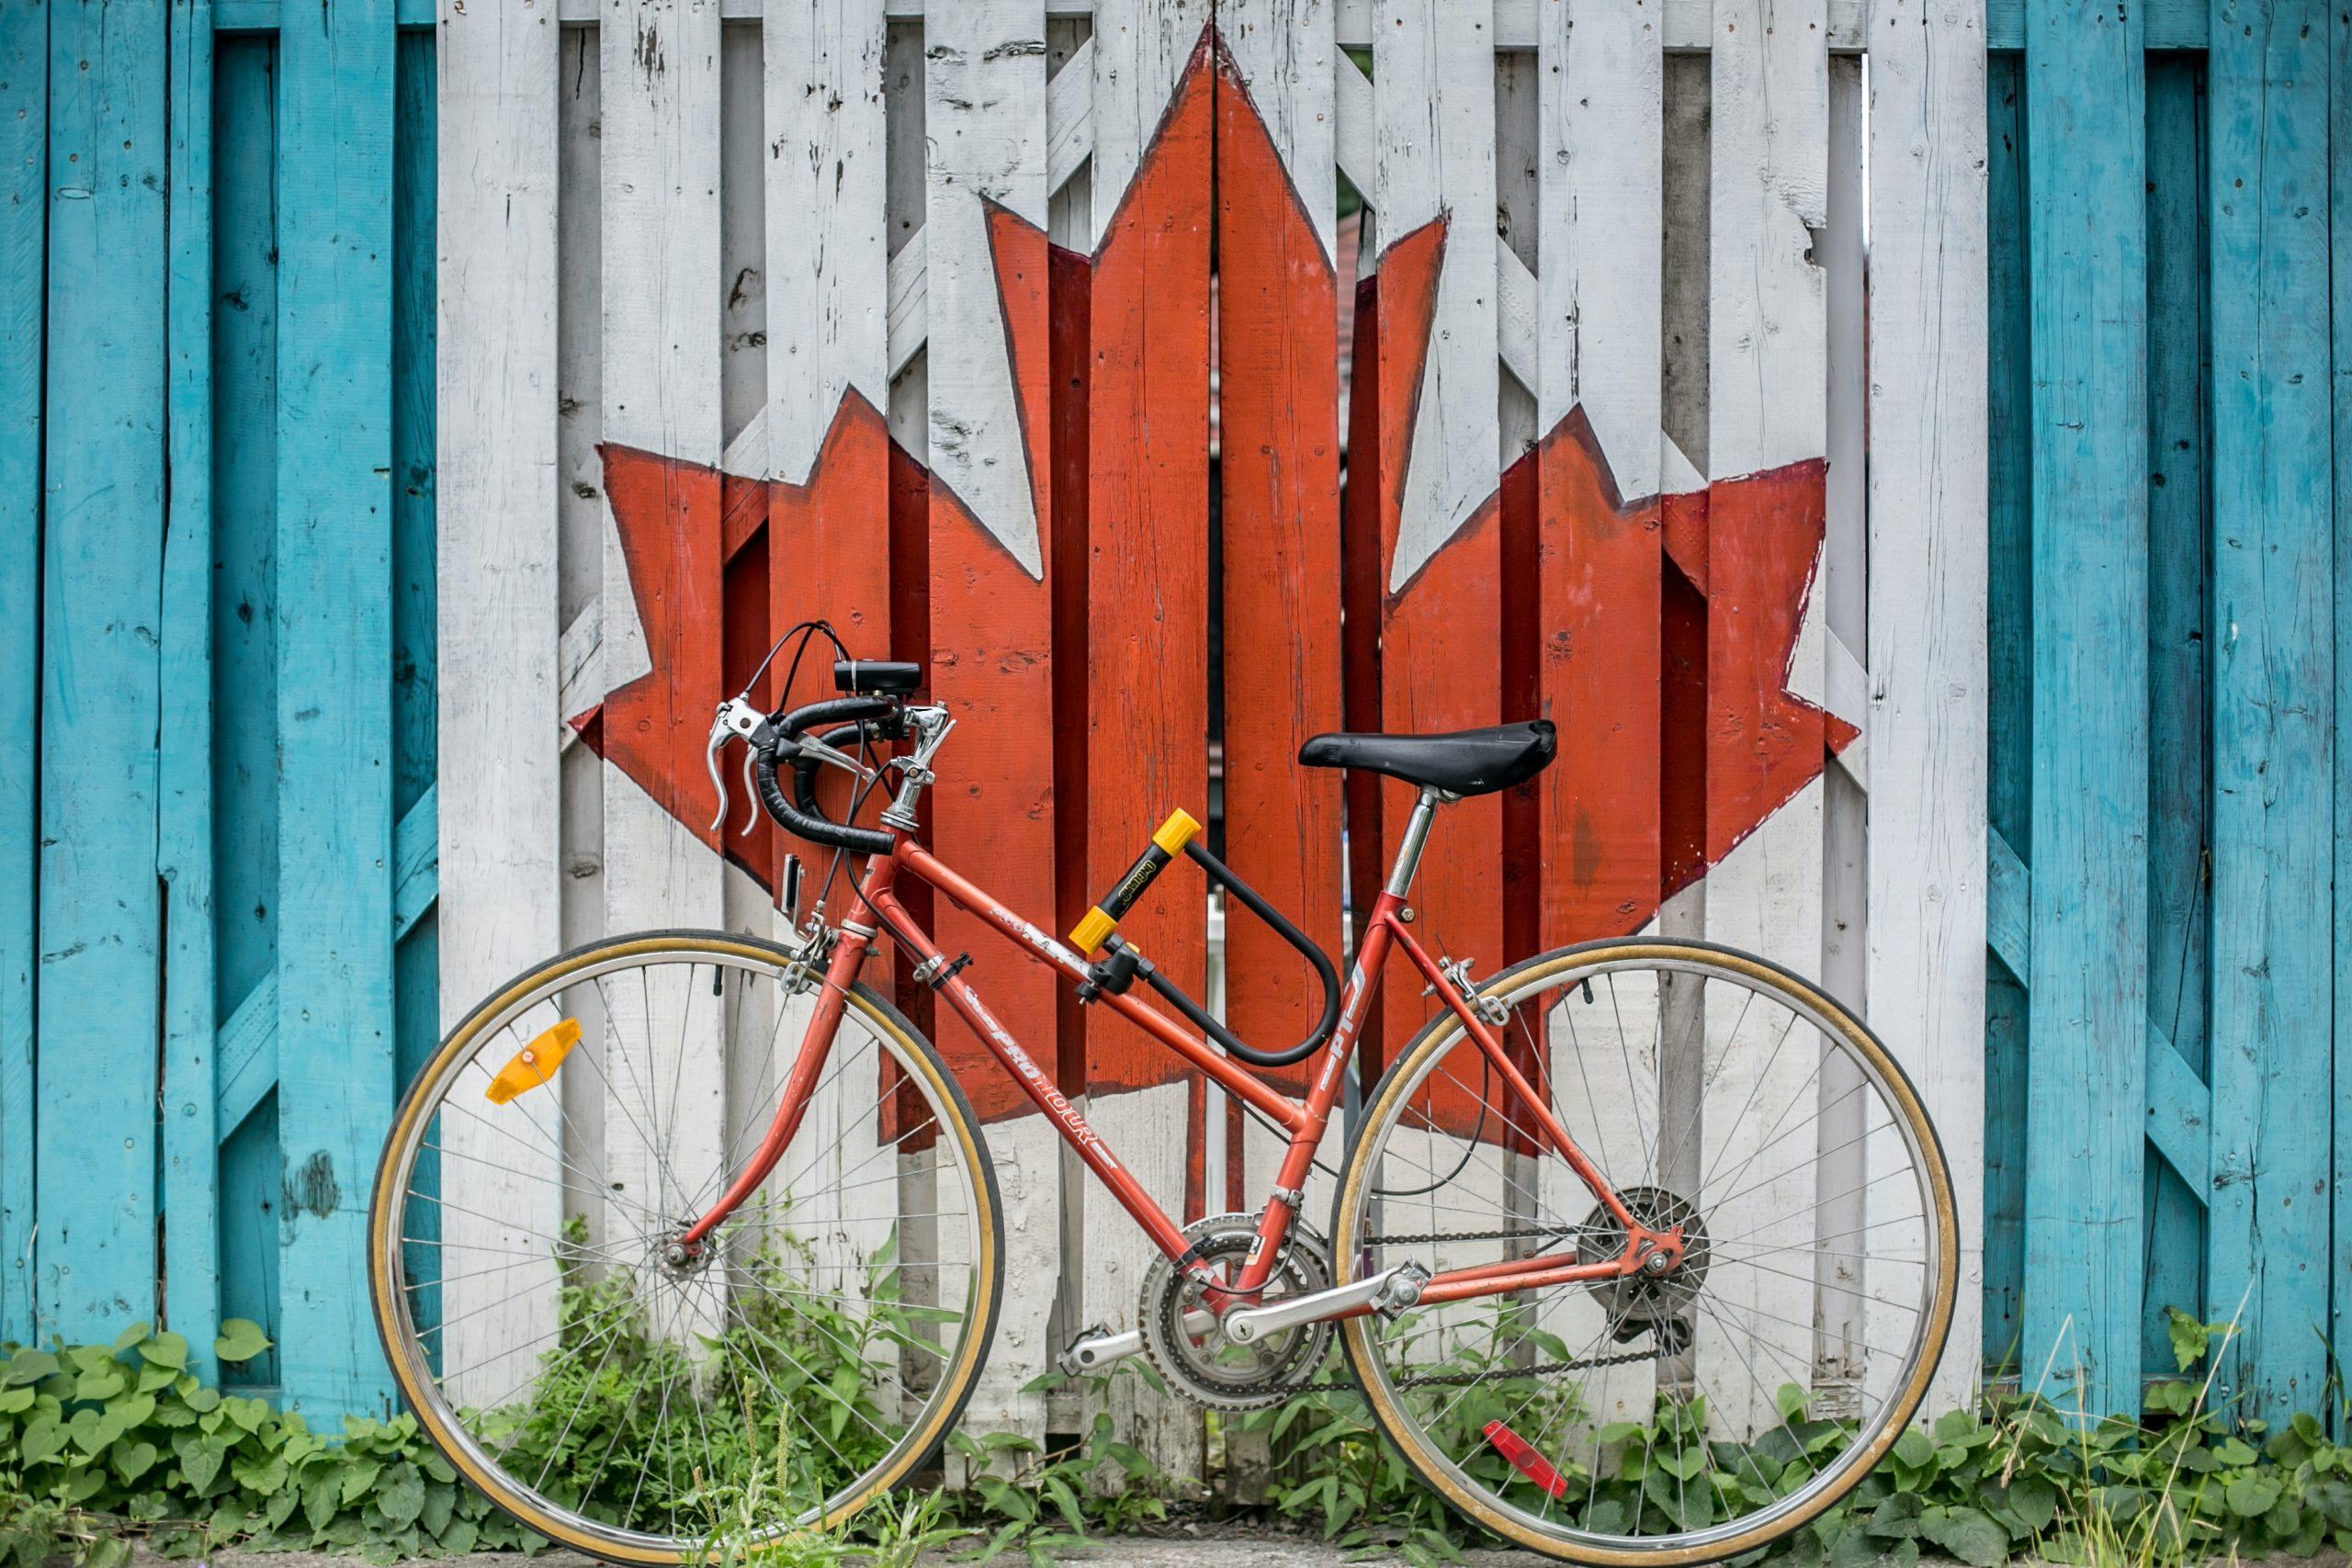 bike resting on a fence